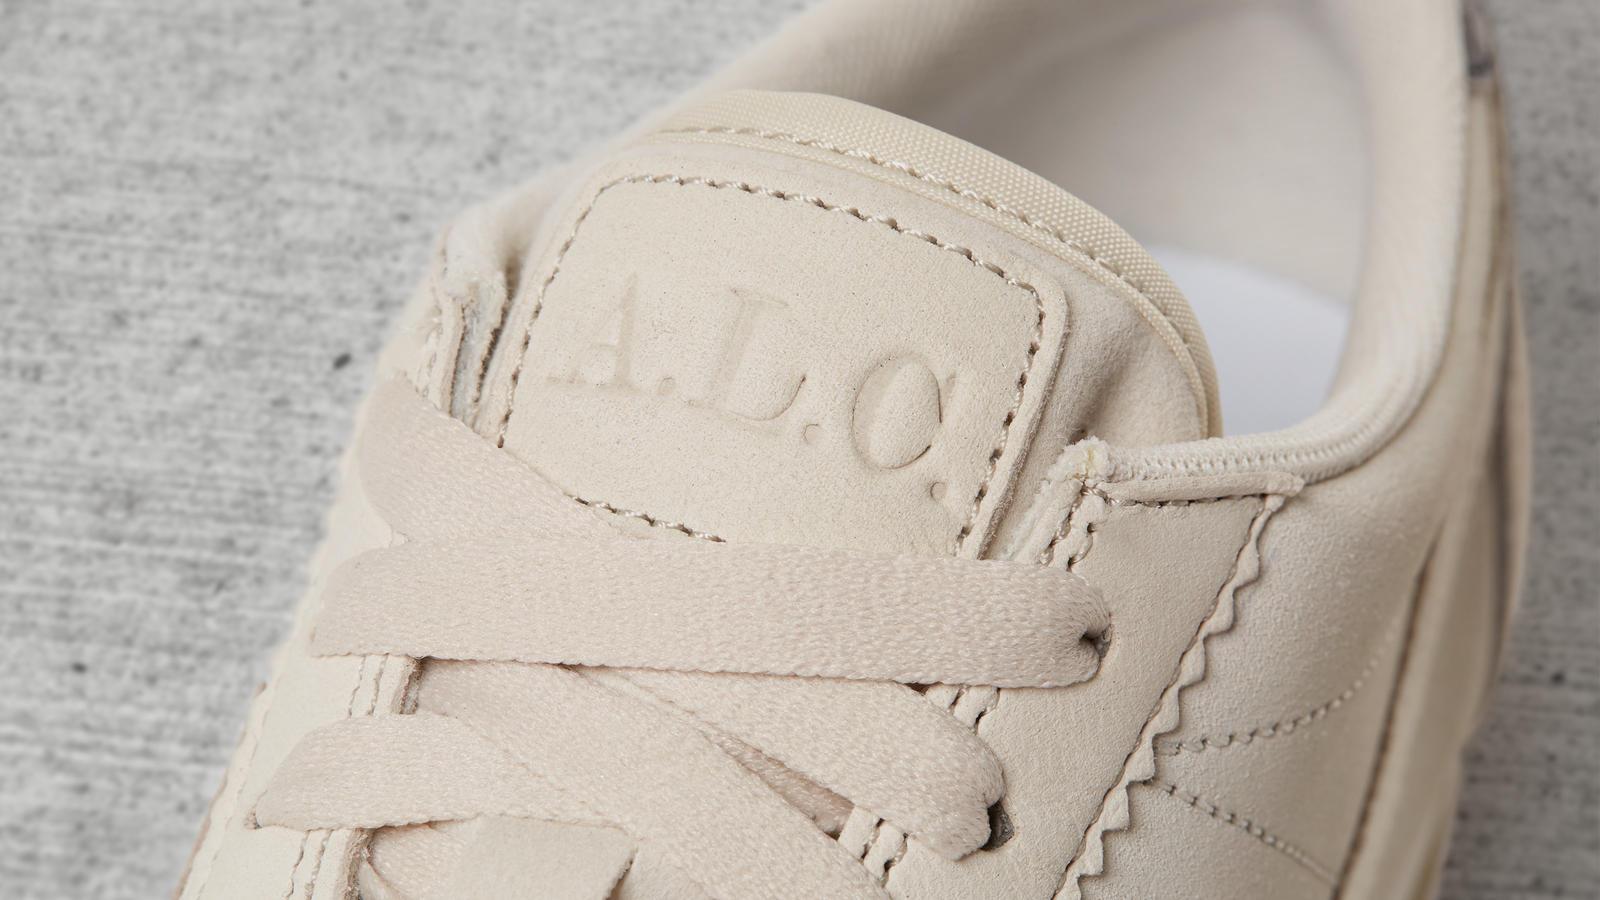 Nike Cortez Classic LX x A.L.C. 1